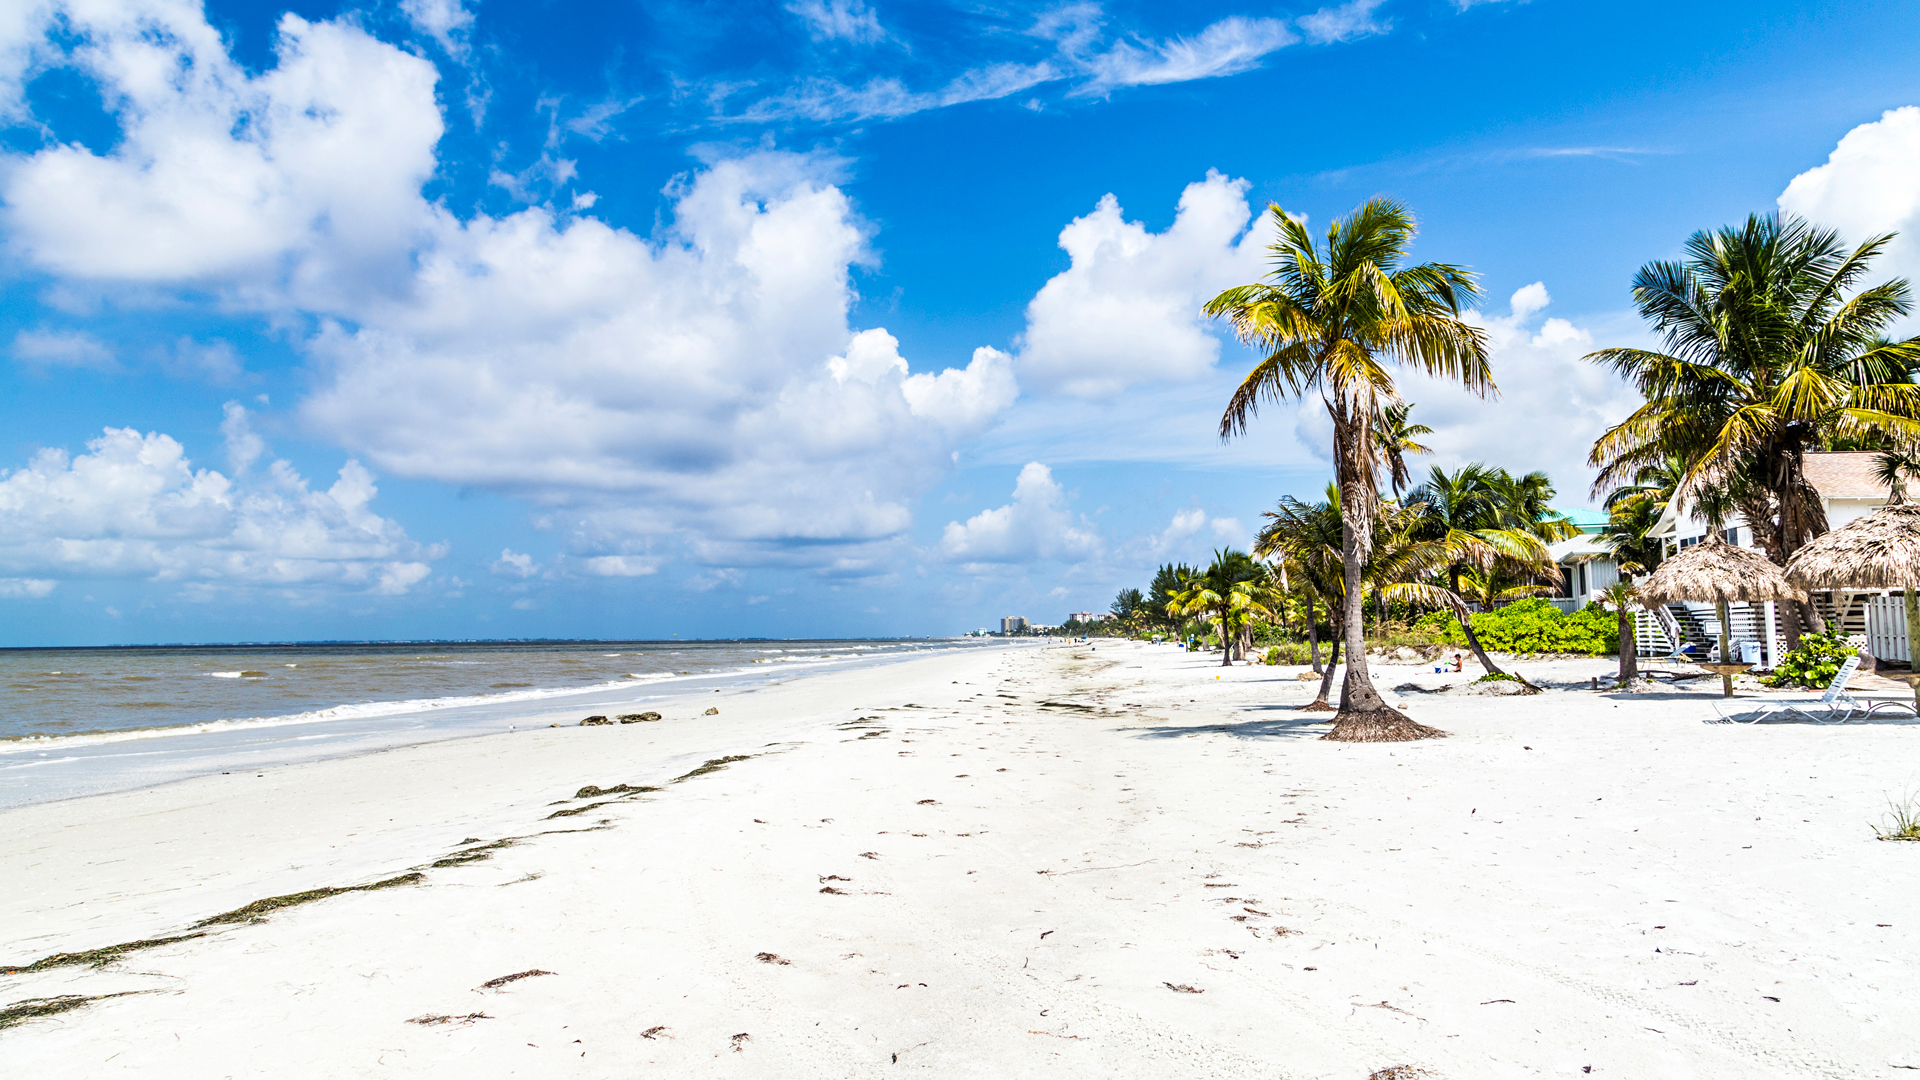 Floridan Fort Myersin rannat